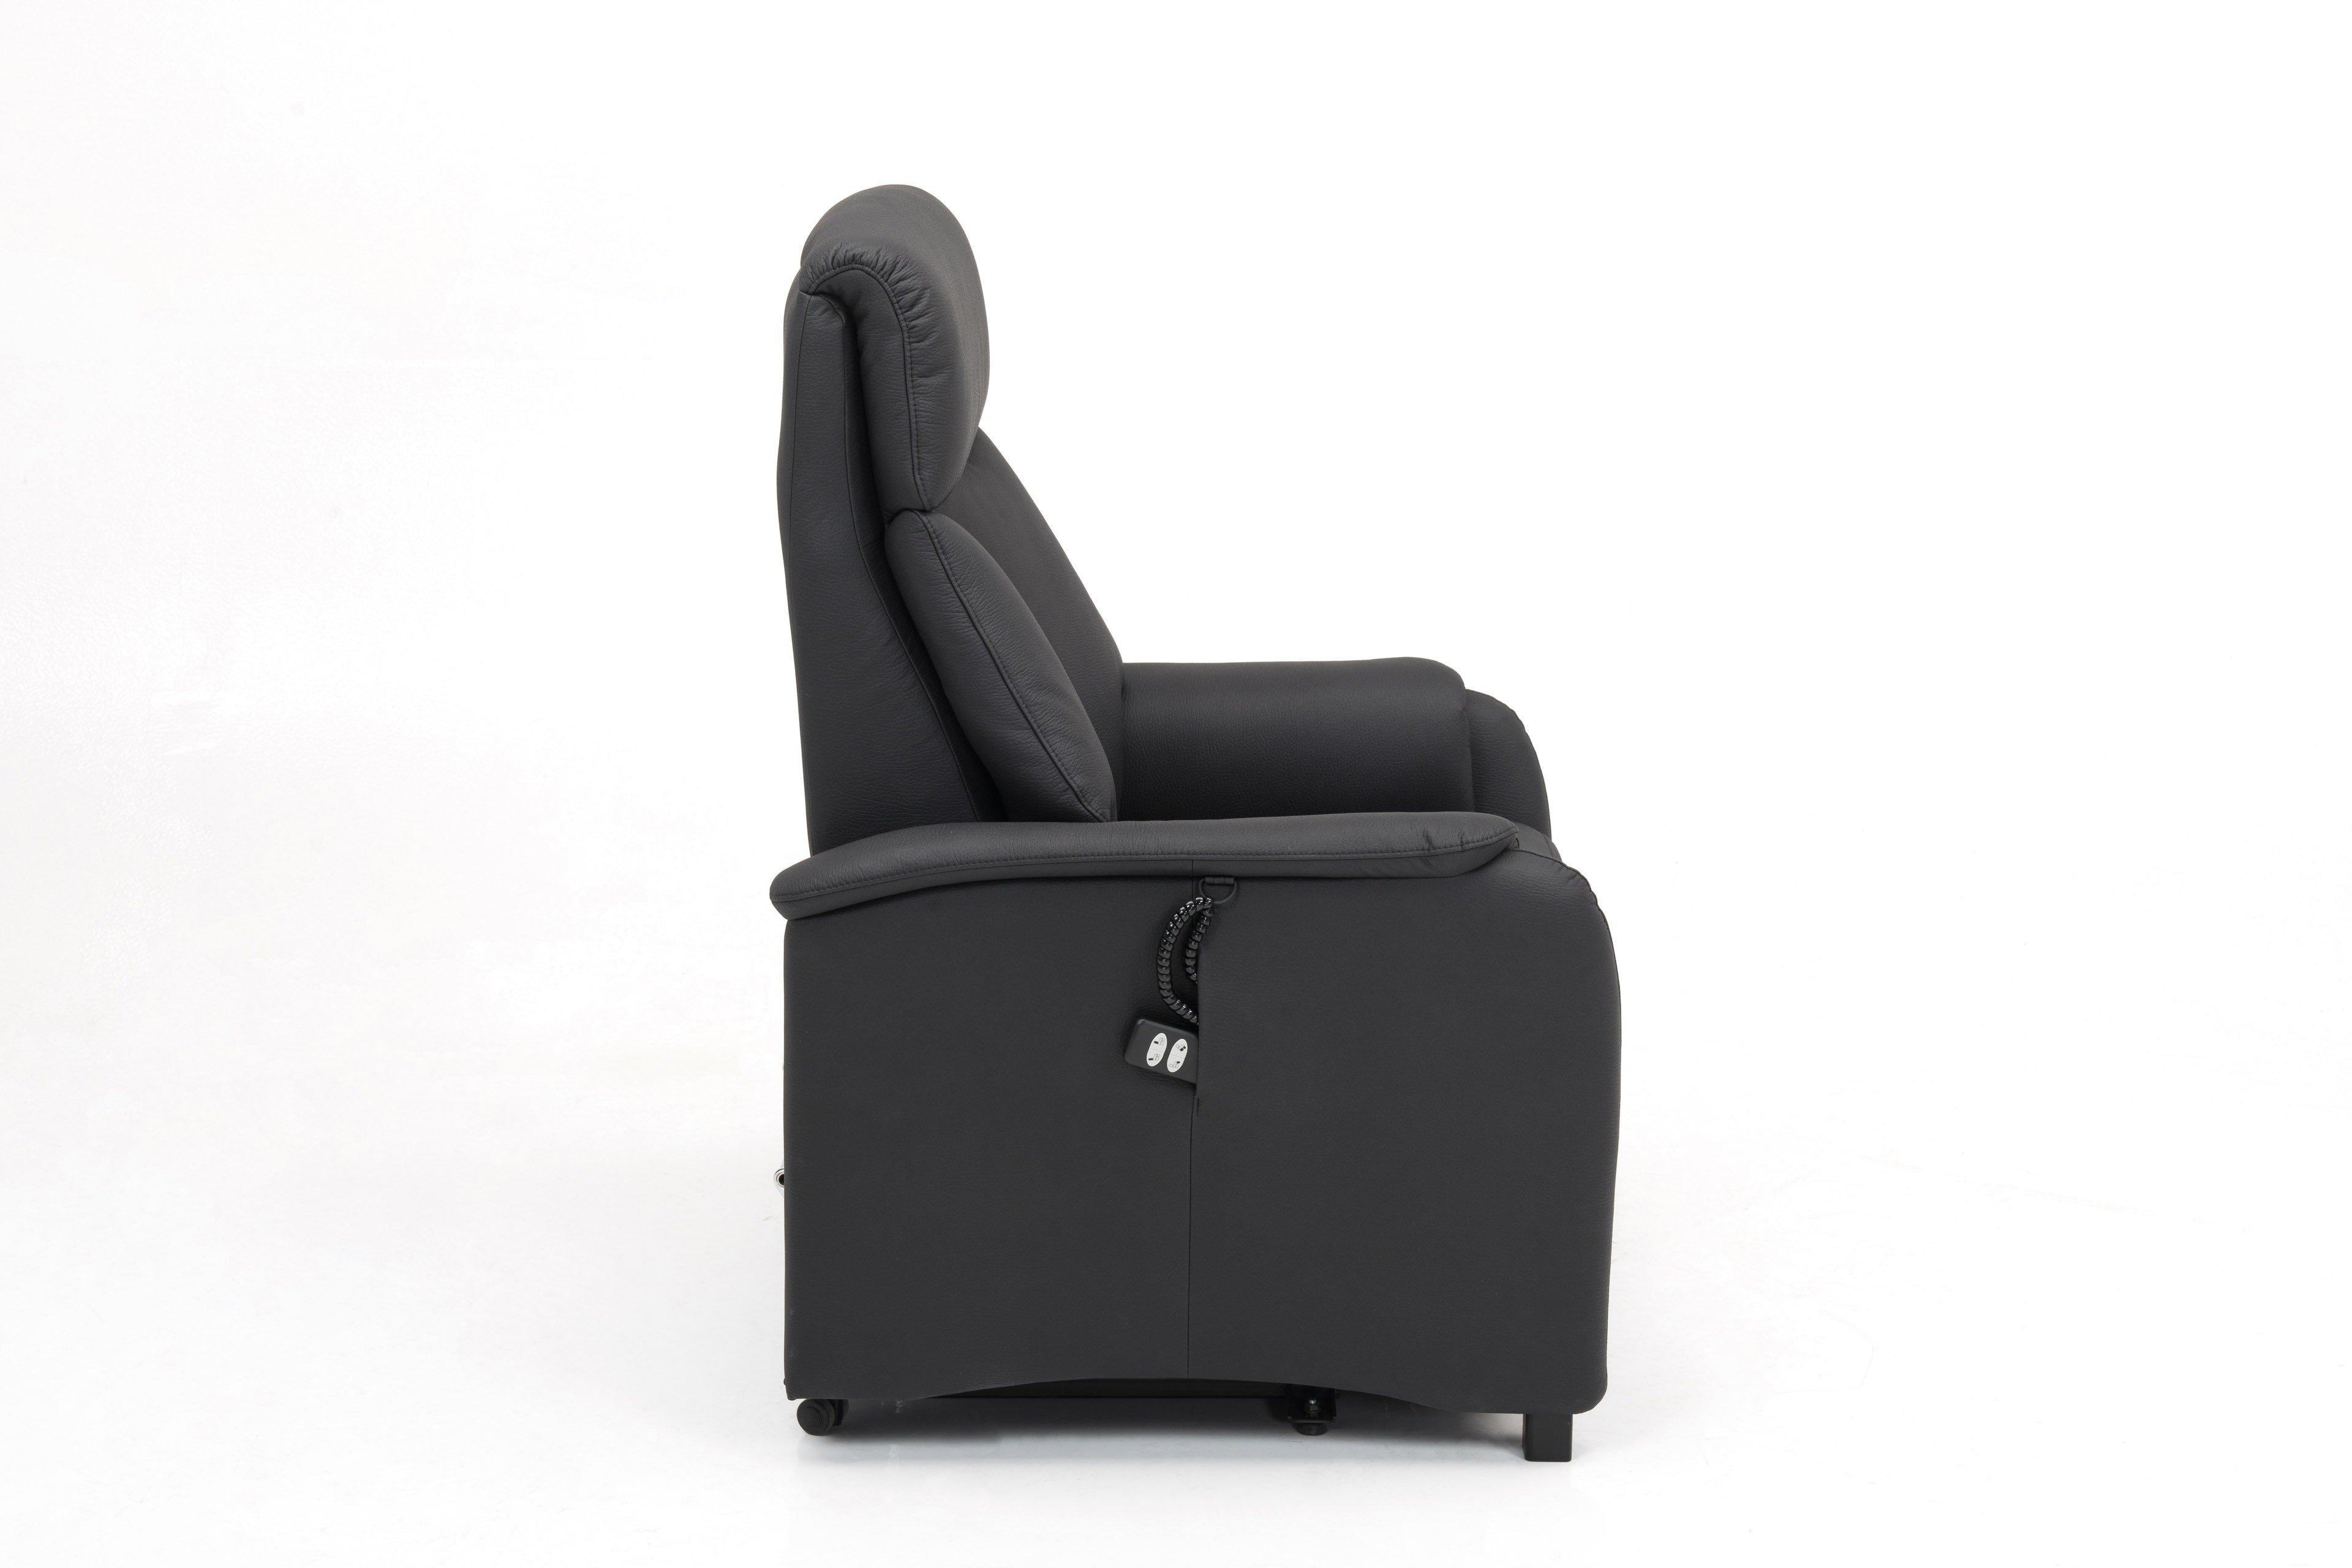 skandinavische m bel dilja funktionssessel in schwarz m bel letz ihr online shop. Black Bedroom Furniture Sets. Home Design Ideas